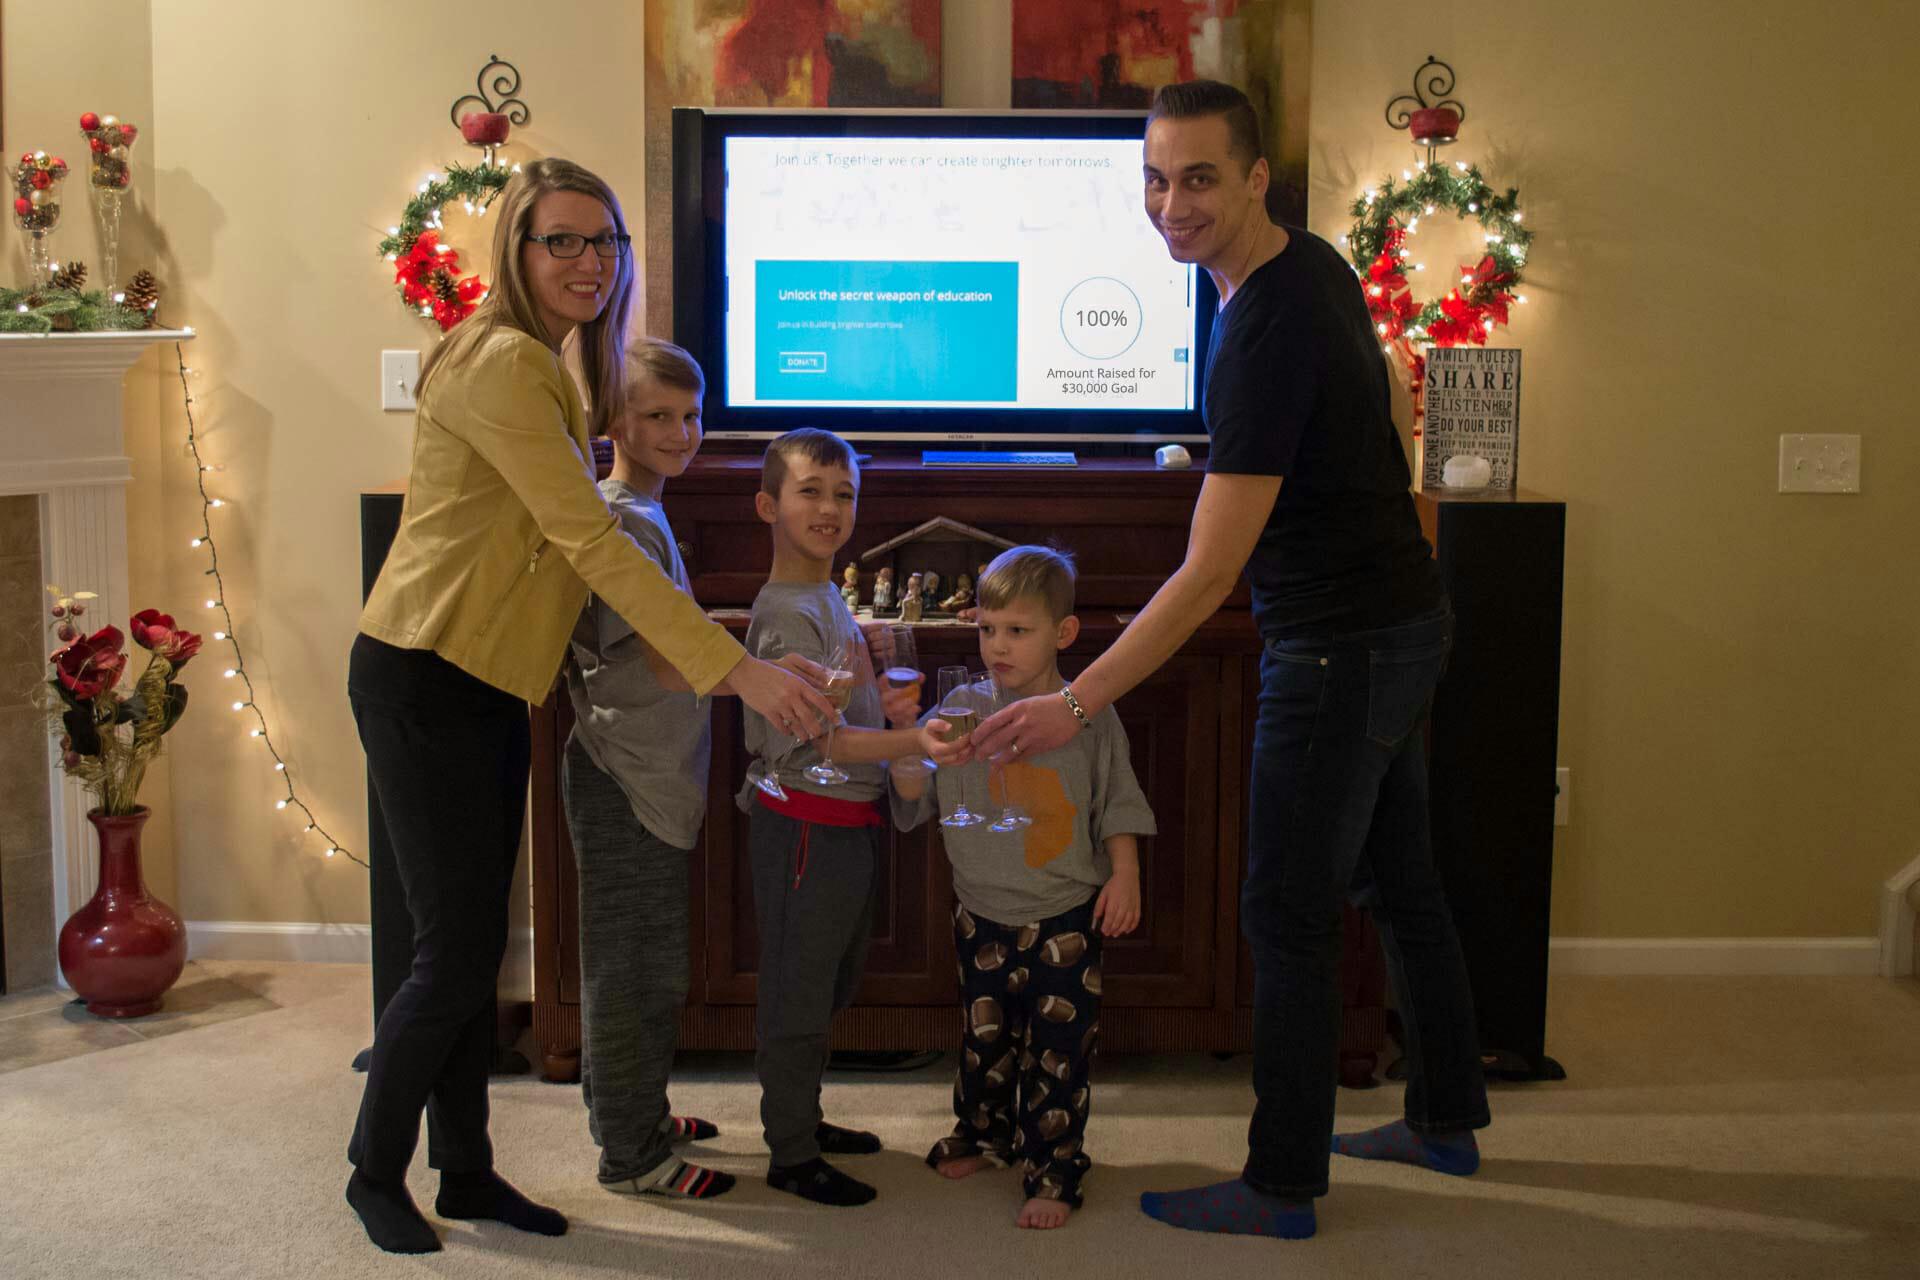 vreeman family celebration project secret weapon